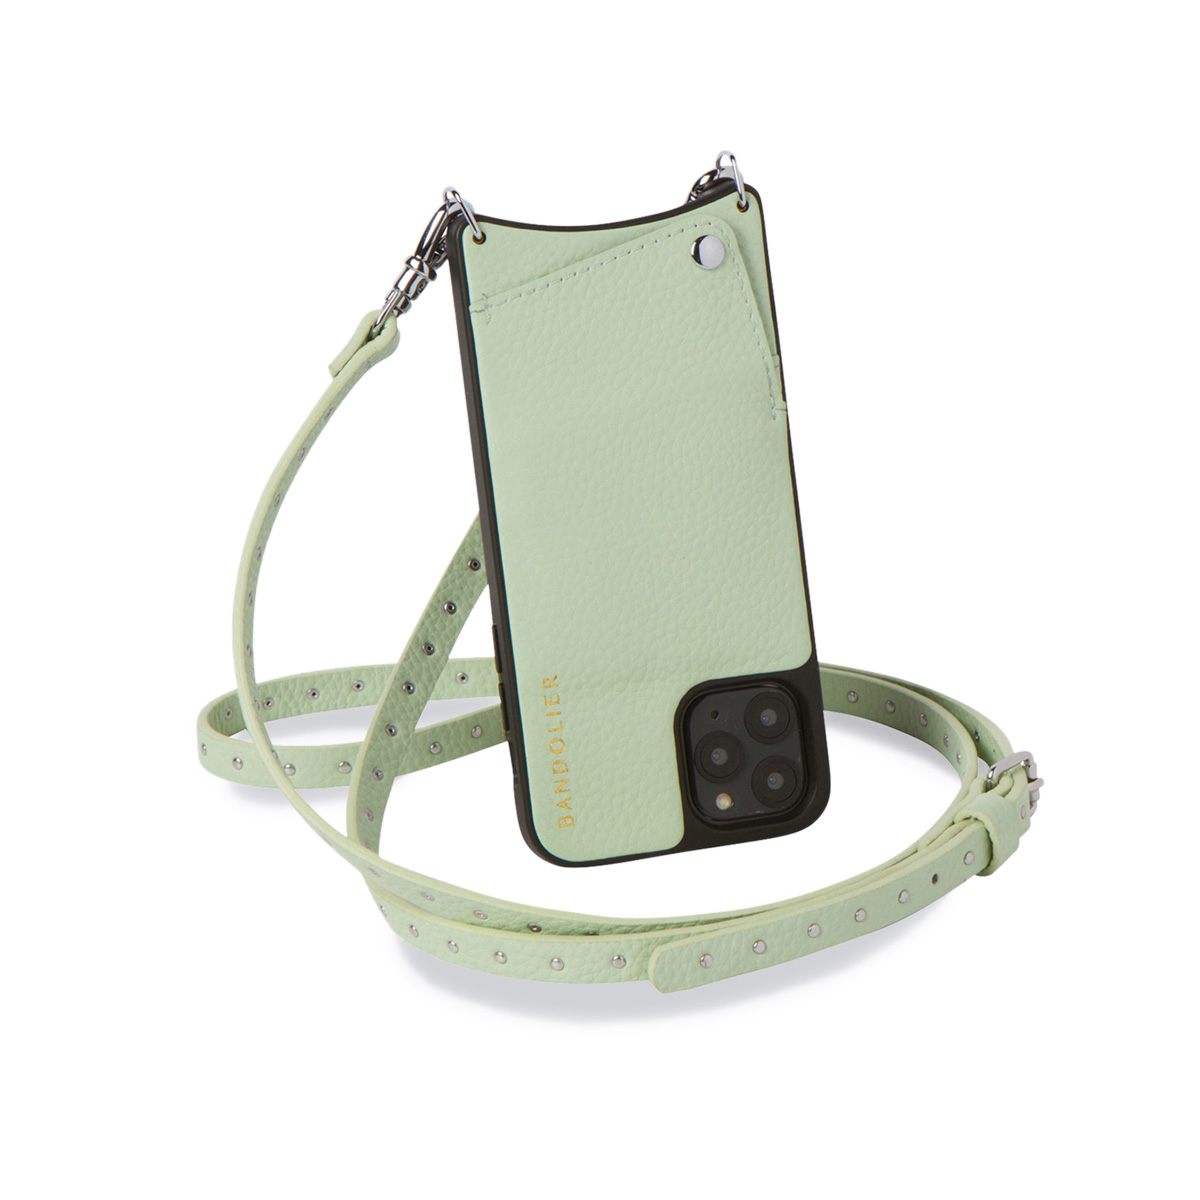 BANDOLIER NICOLE MIST GREEN バンドリヤー iPhone11 Pro MAX ケース スマホ 携帯 ショルダー アイフォン ニコル メンズ レディース レザー グリーン 10NIC